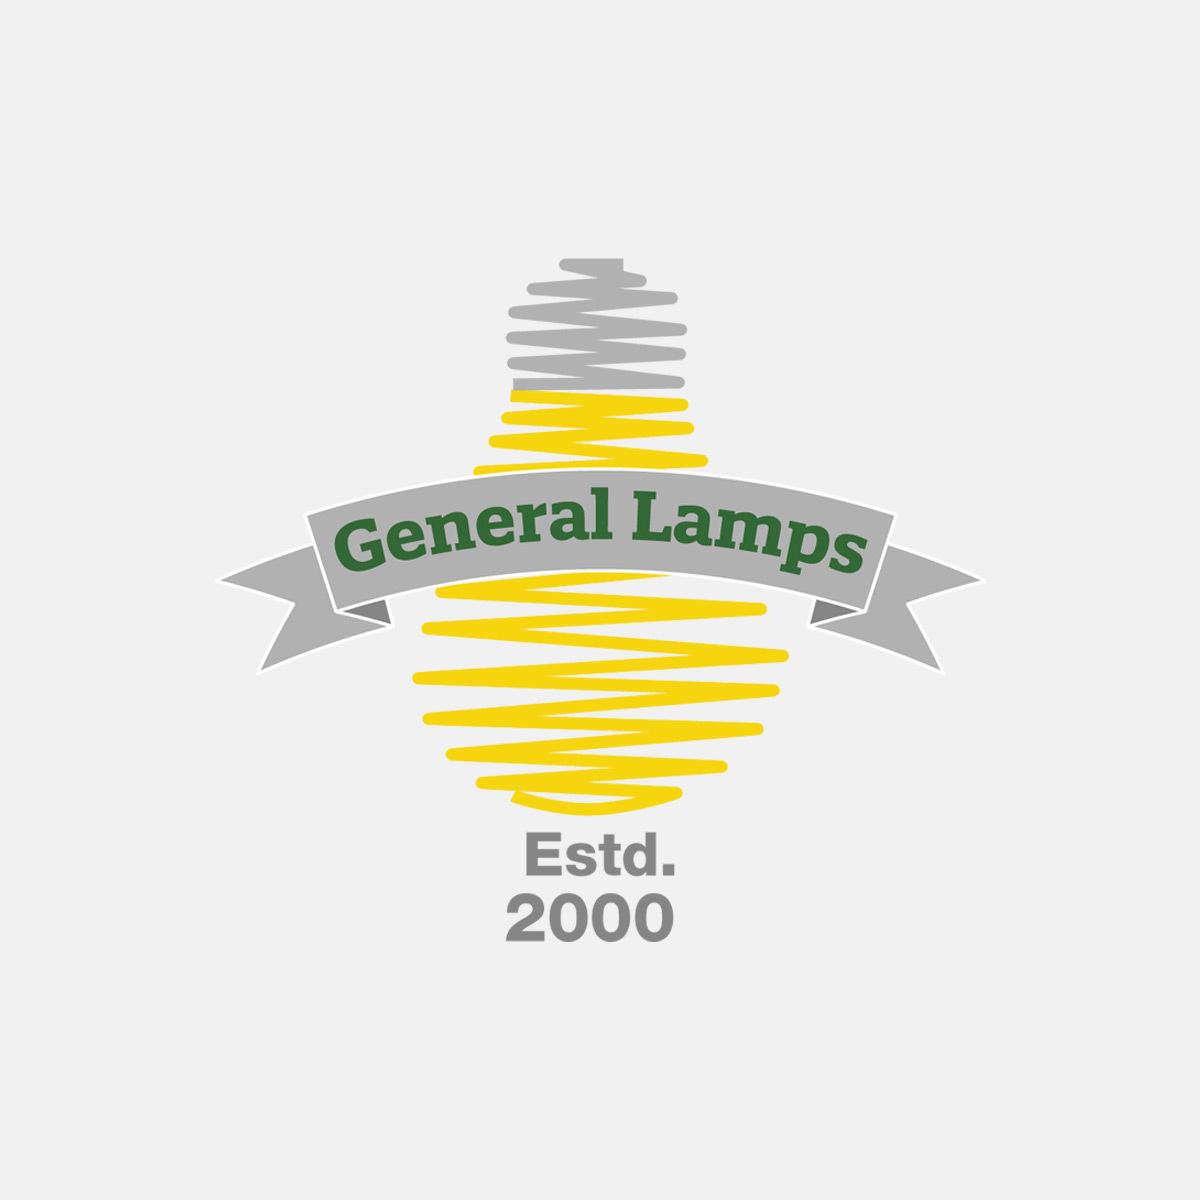 500w led flood light bulb 100 images 500w led spotlight 500w led flood light bulb led floodlight 500w replacement pir 500w led flood light aloadofball Choice Image